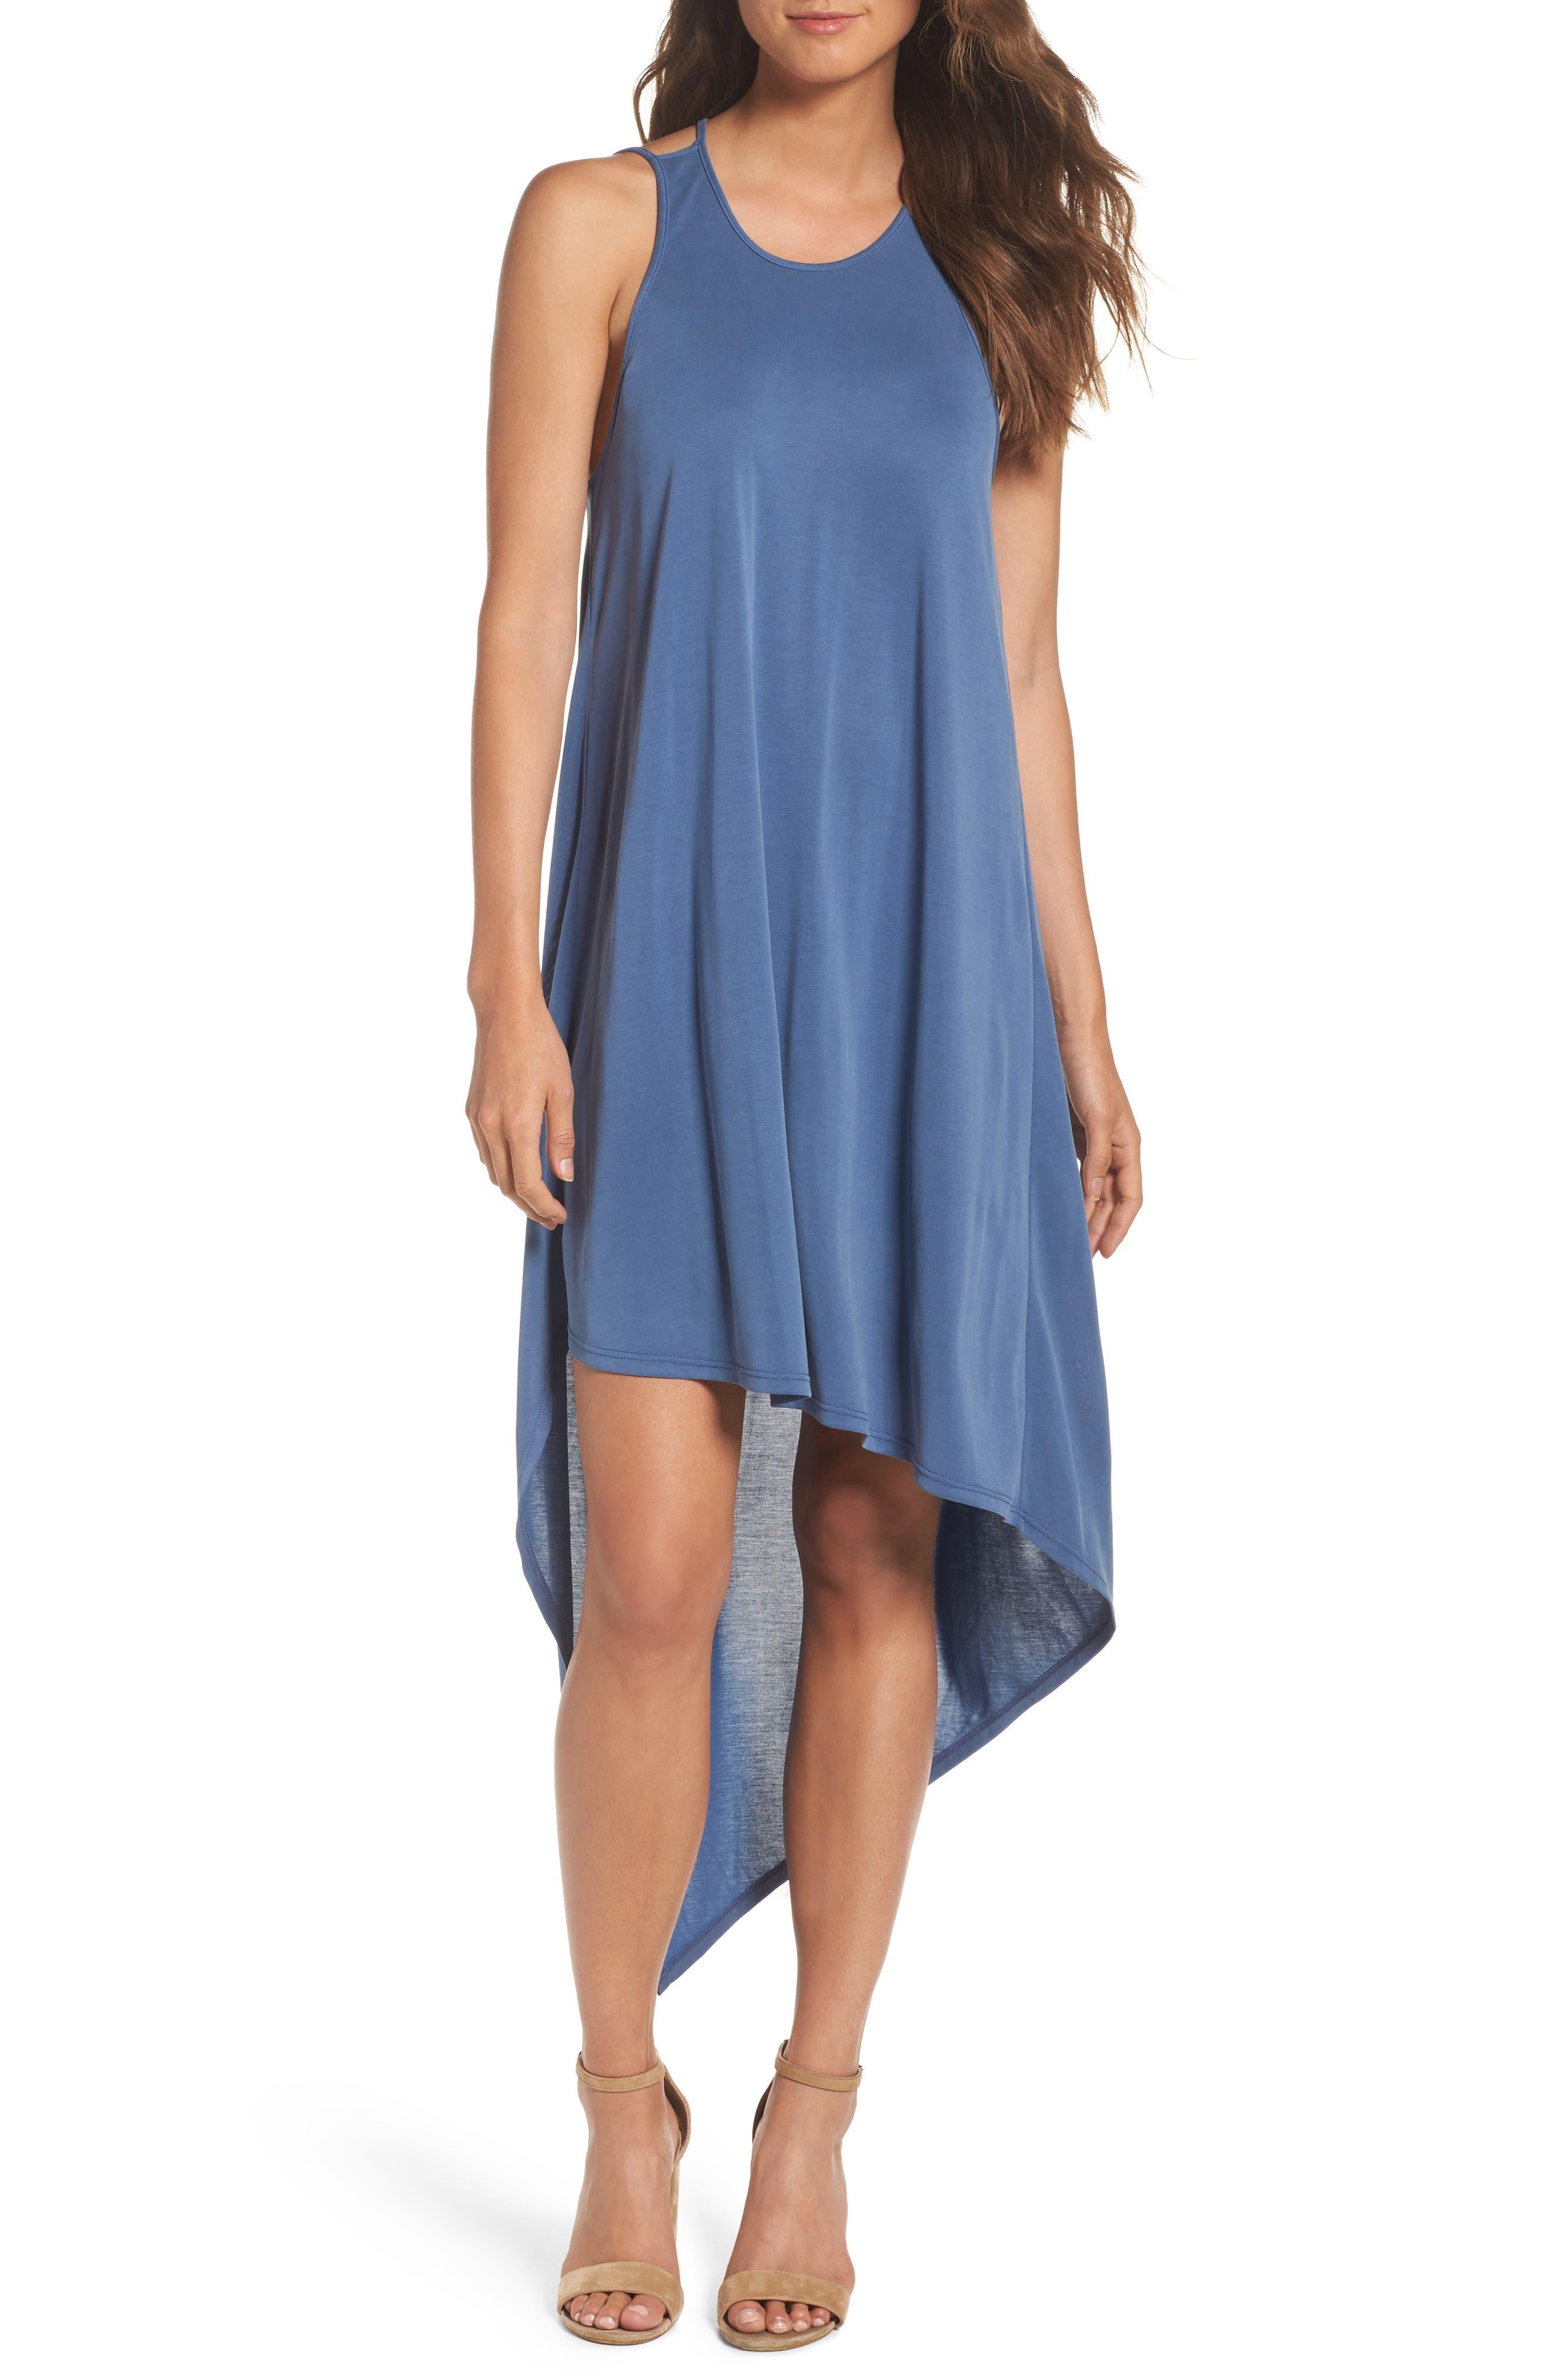 Alternate Image 1 Selected - BCBGMAXAZRIA Asymmetrical Modal Blend Dress